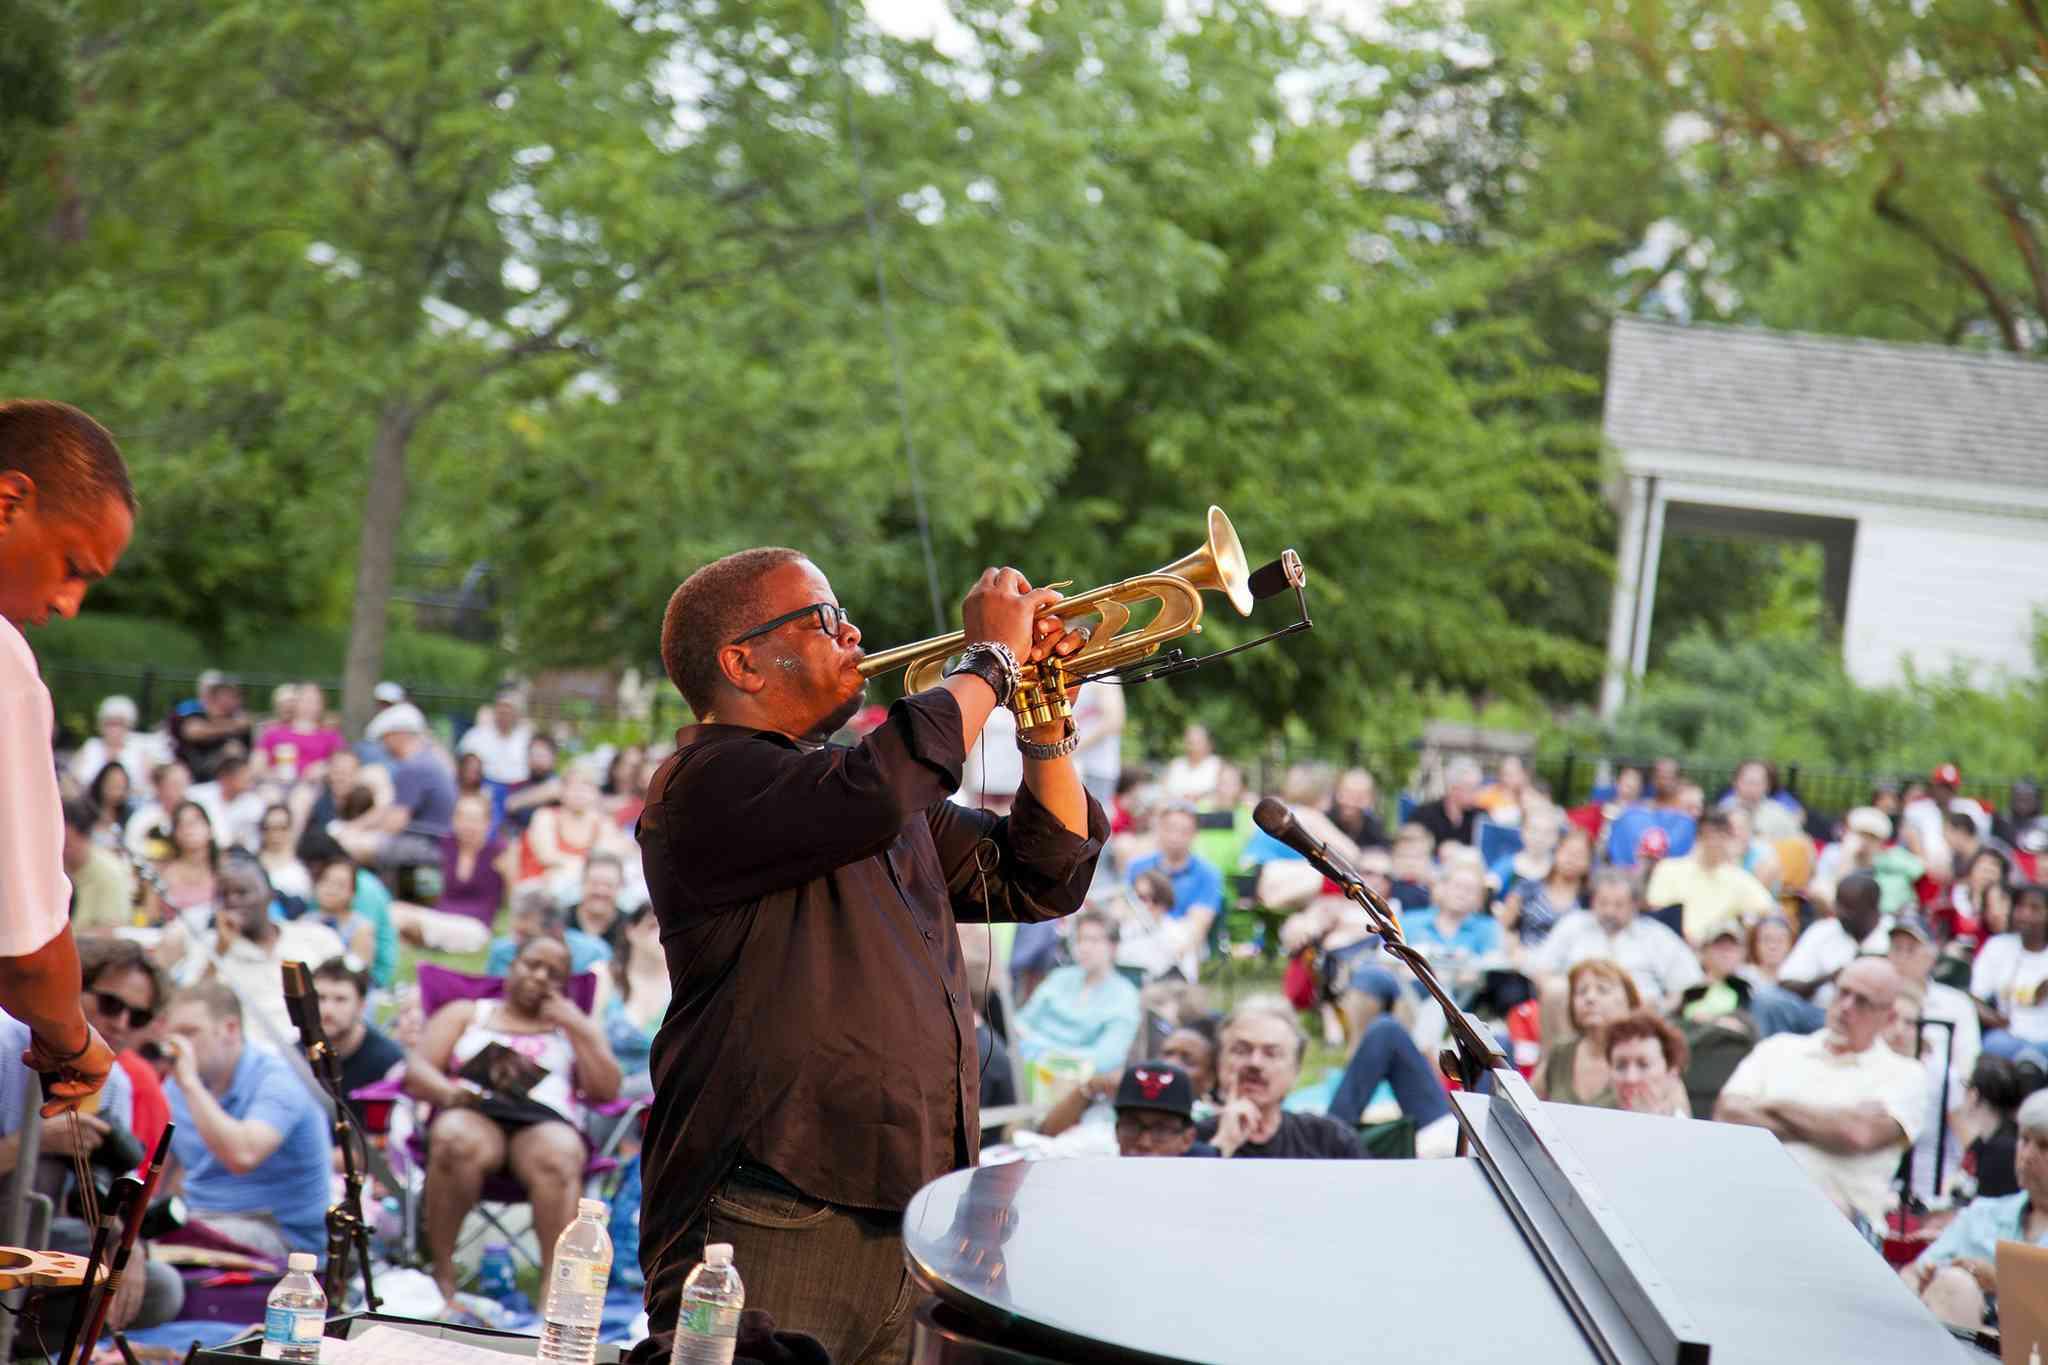 Festival de Música Whitaker en el Jardín Botánico de Missouri